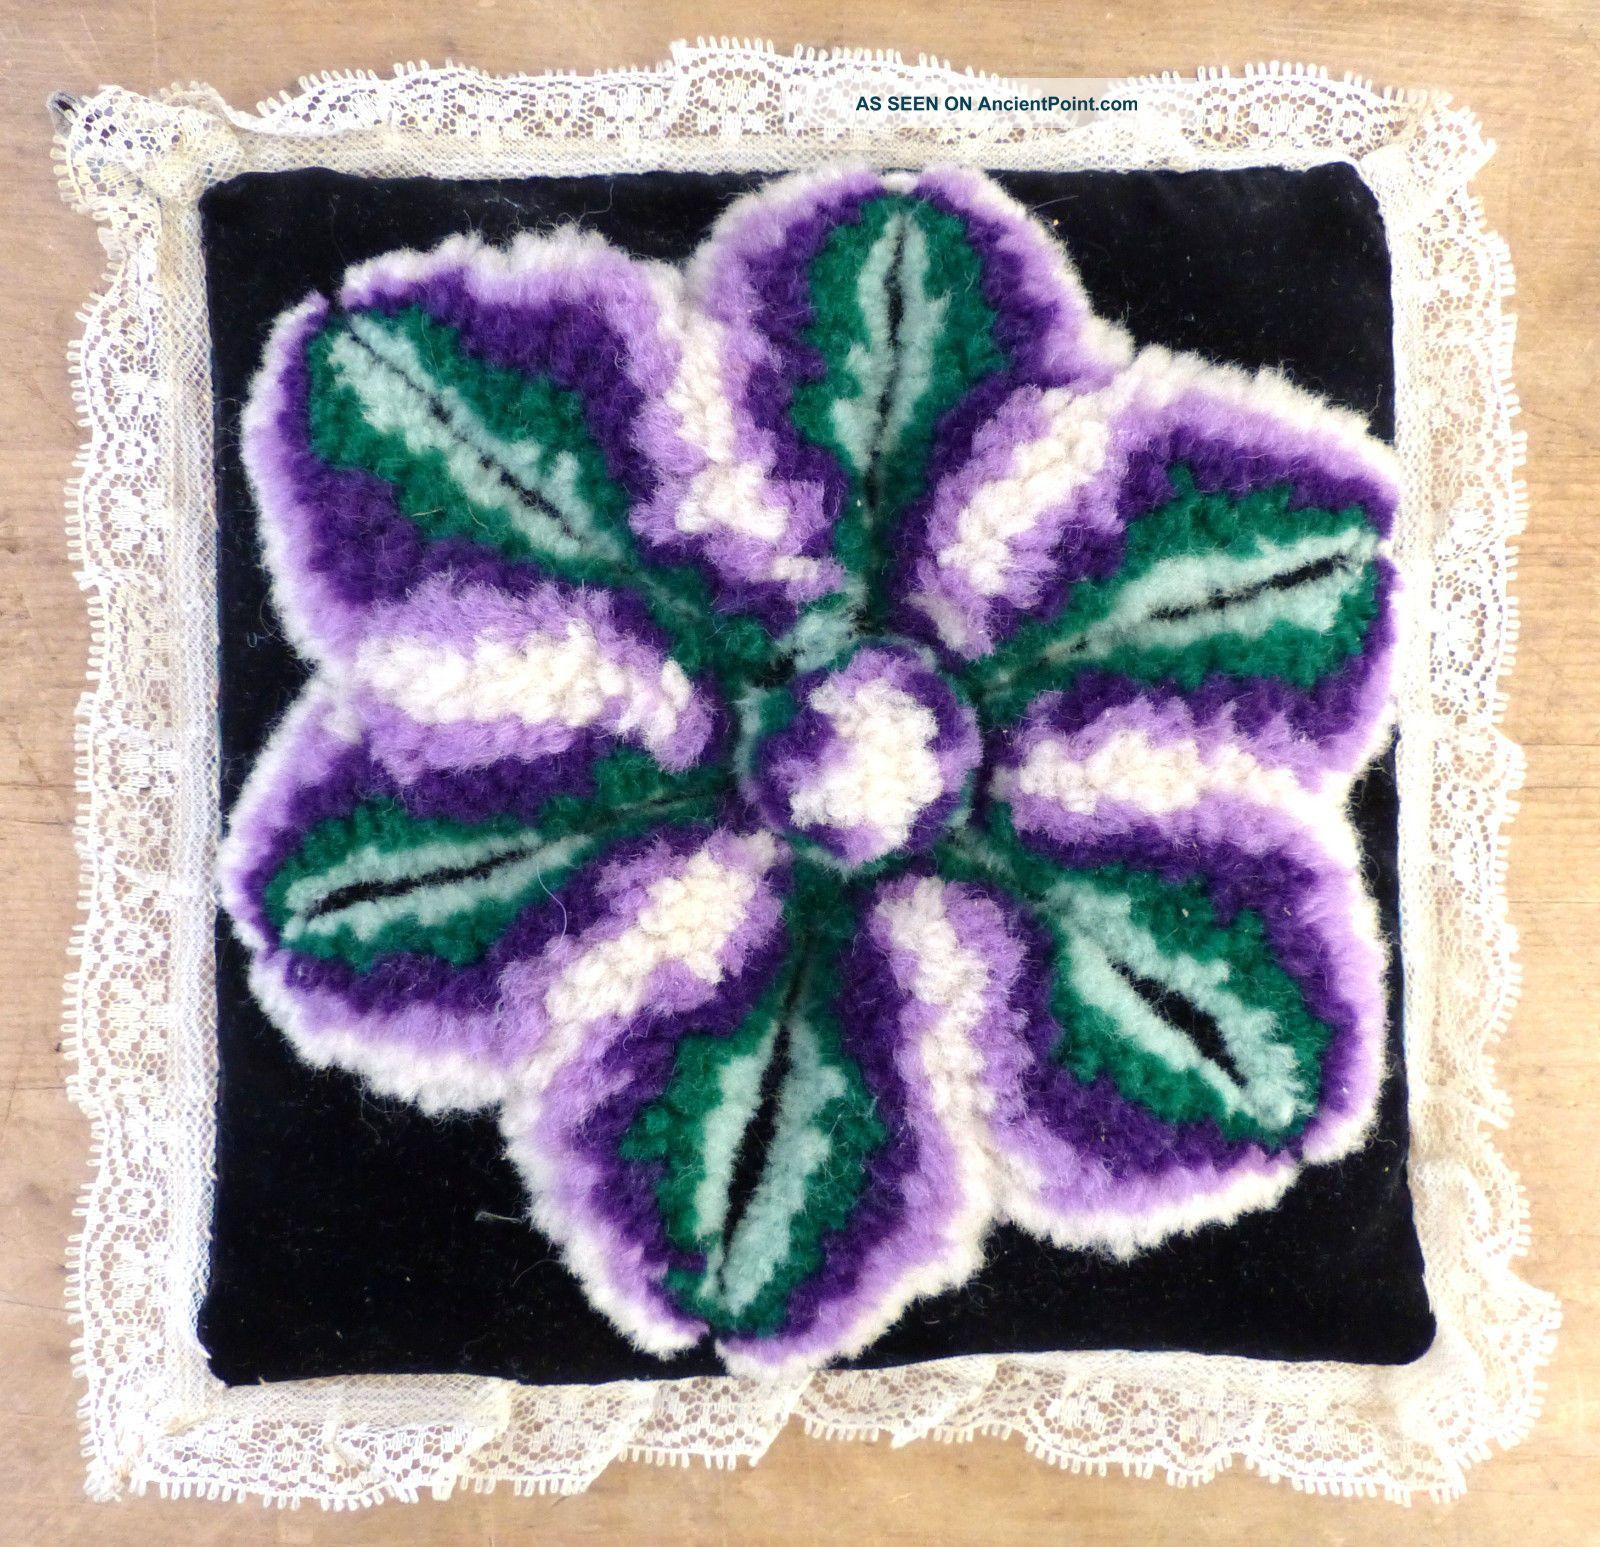 Antique Folk Art Mennonite Amish Sewing Velvet Stumpwork Pin Cushion 2 Pin Cushions photo